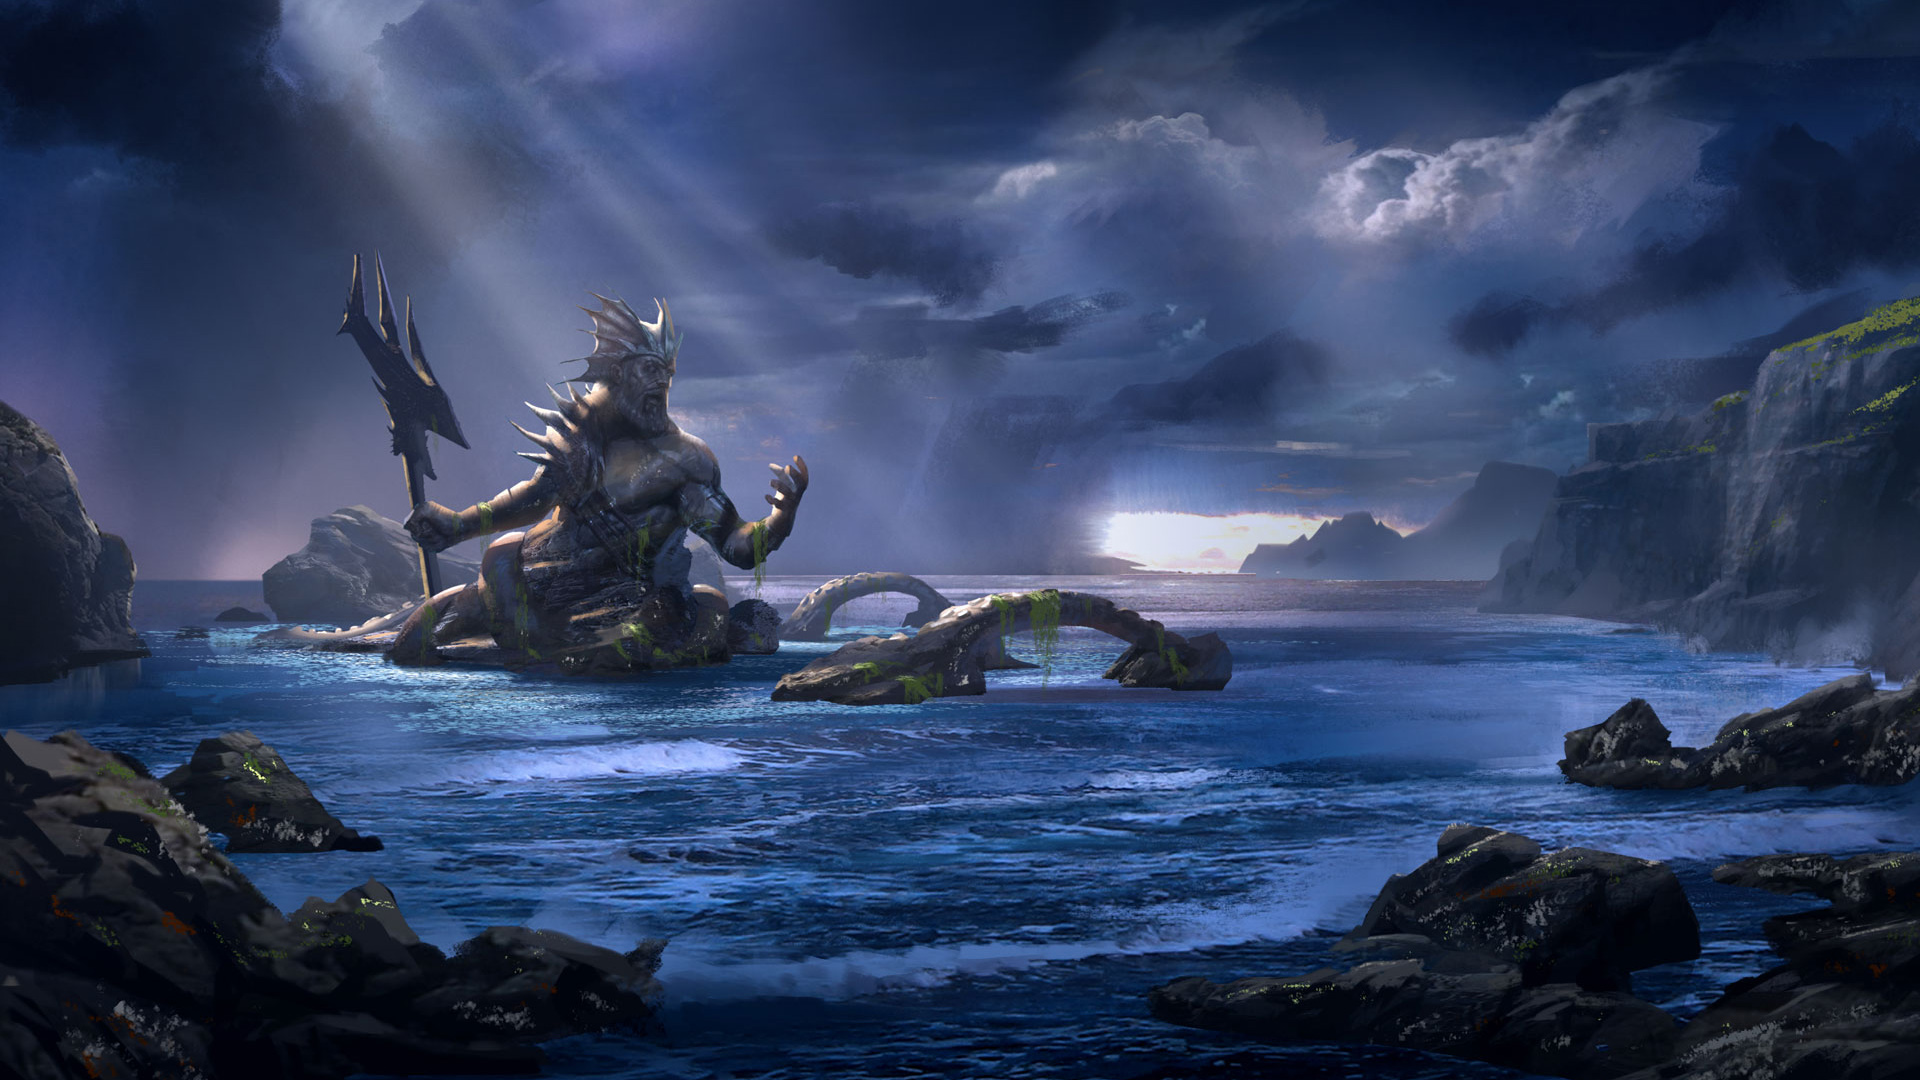 God Of War Ascension Poseidon Hd Wallpaper